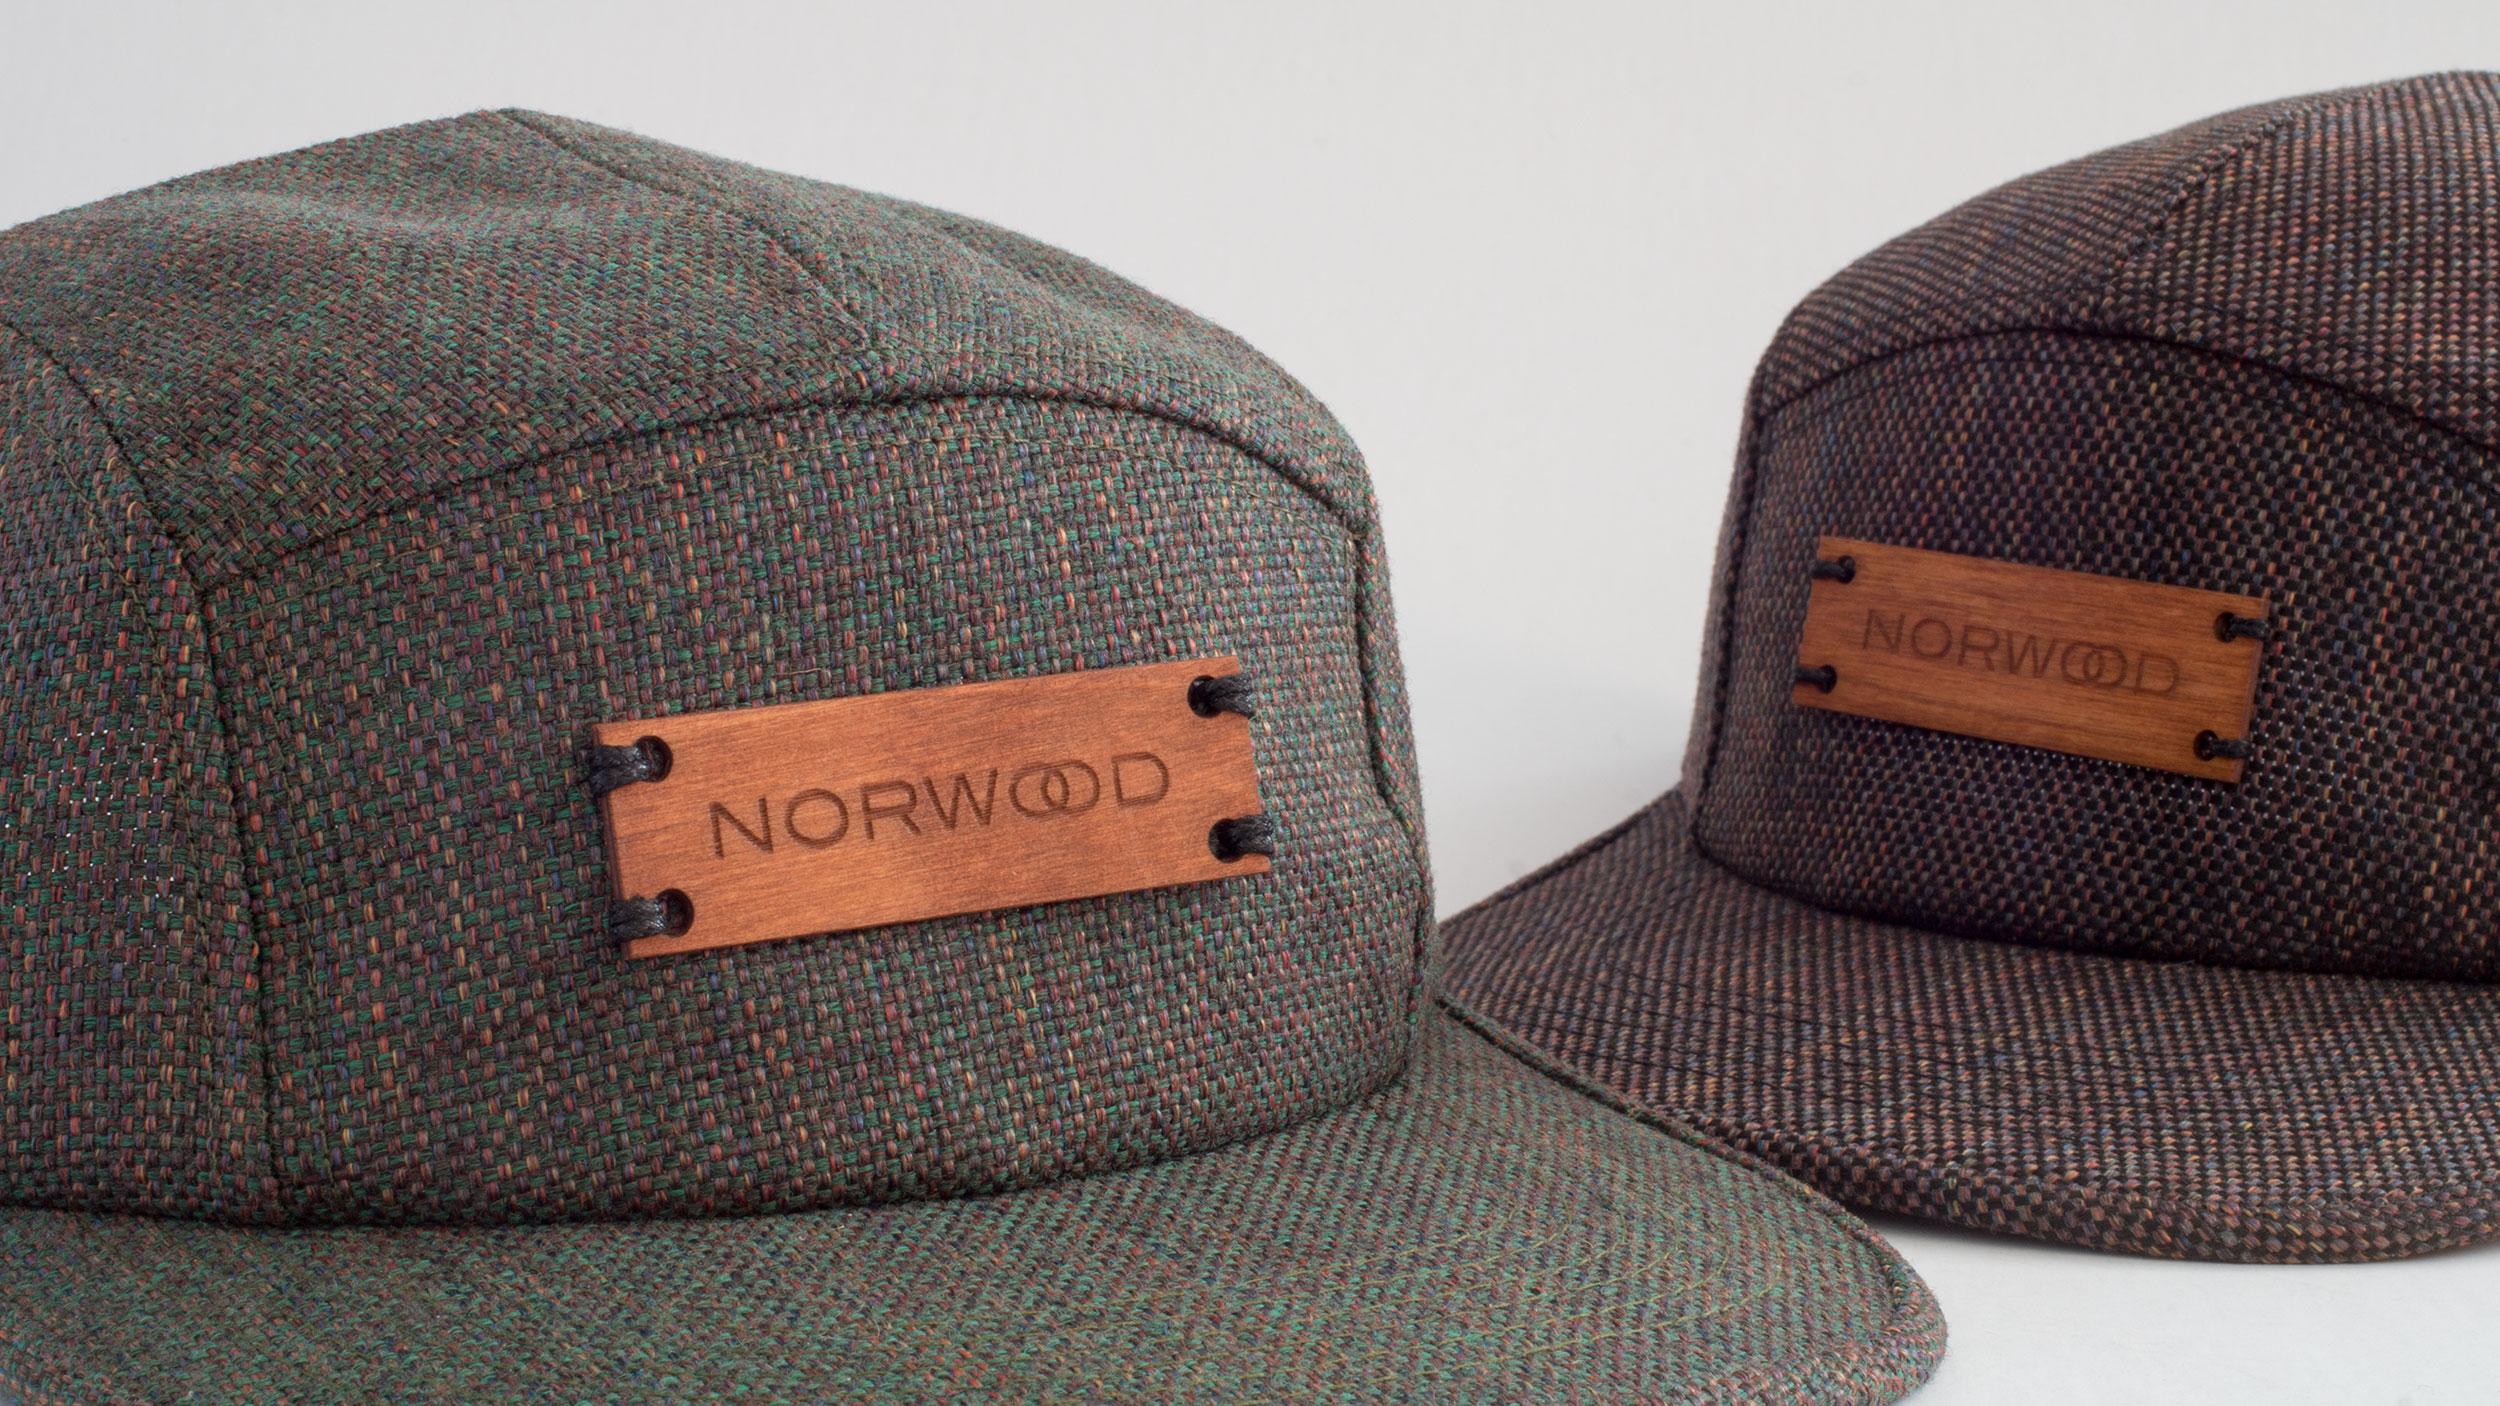 AntonioBrasko-Norwood-Cordura-5PanelCap.jpg